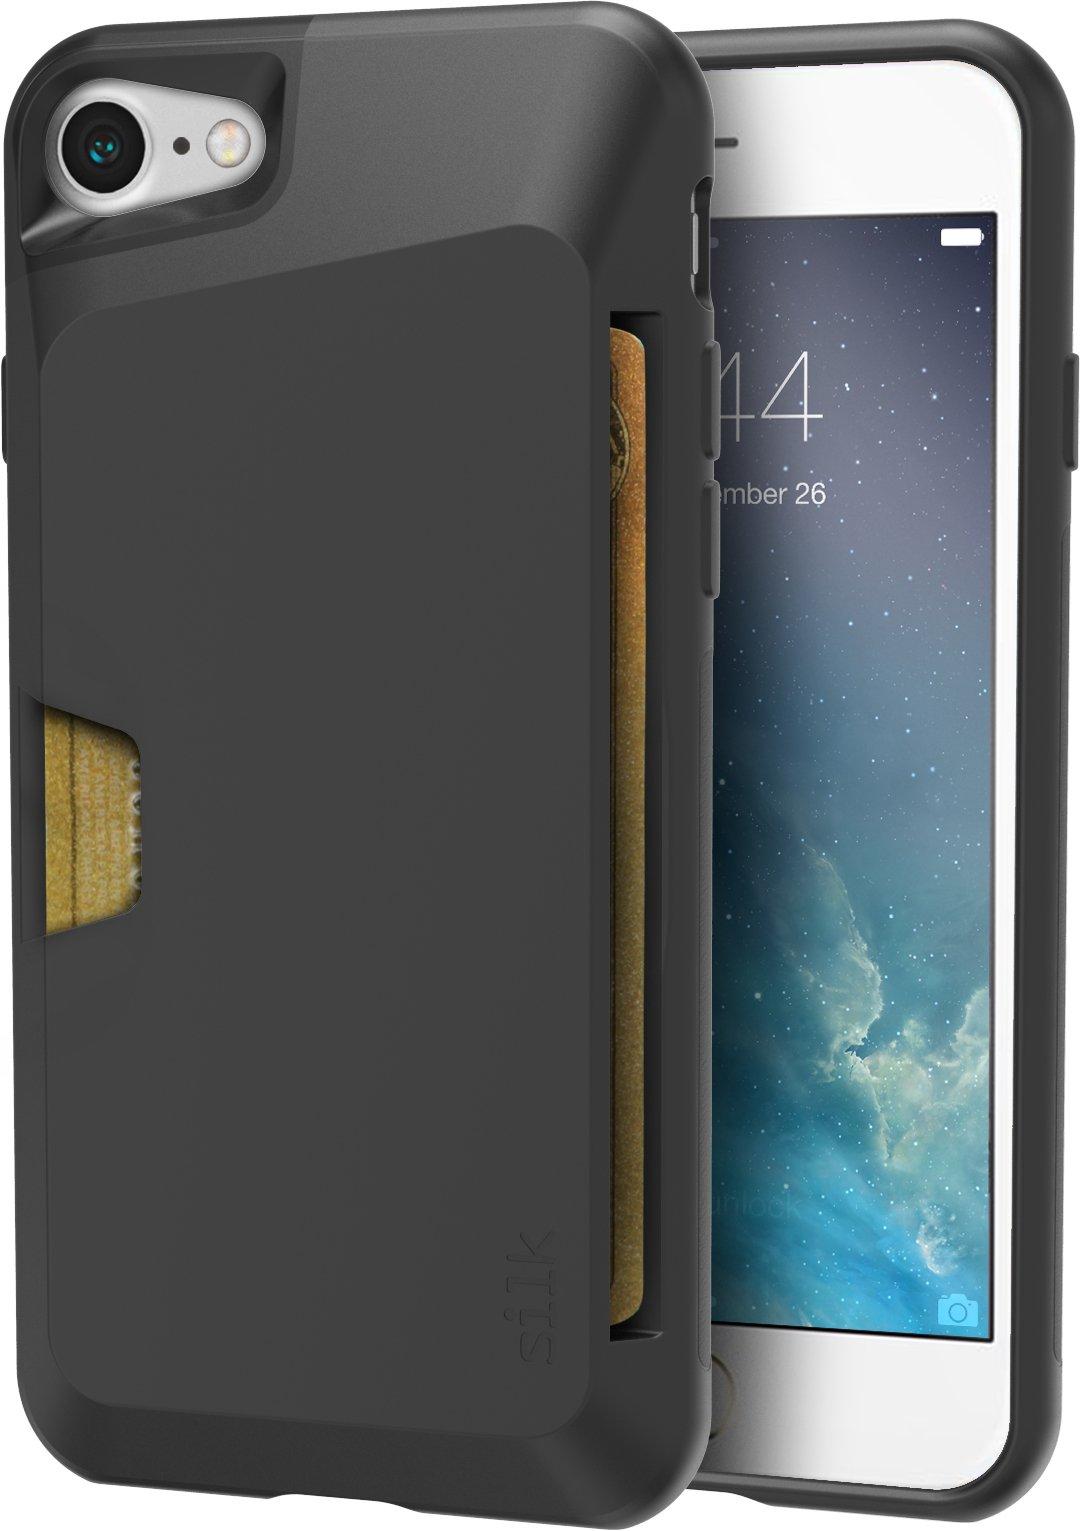 Silk iPhone 7/8 Wallet Case - VAULT Protective Credit Card Grip Cover -''Wallet Slayer Vol.1'' - Black Onyx